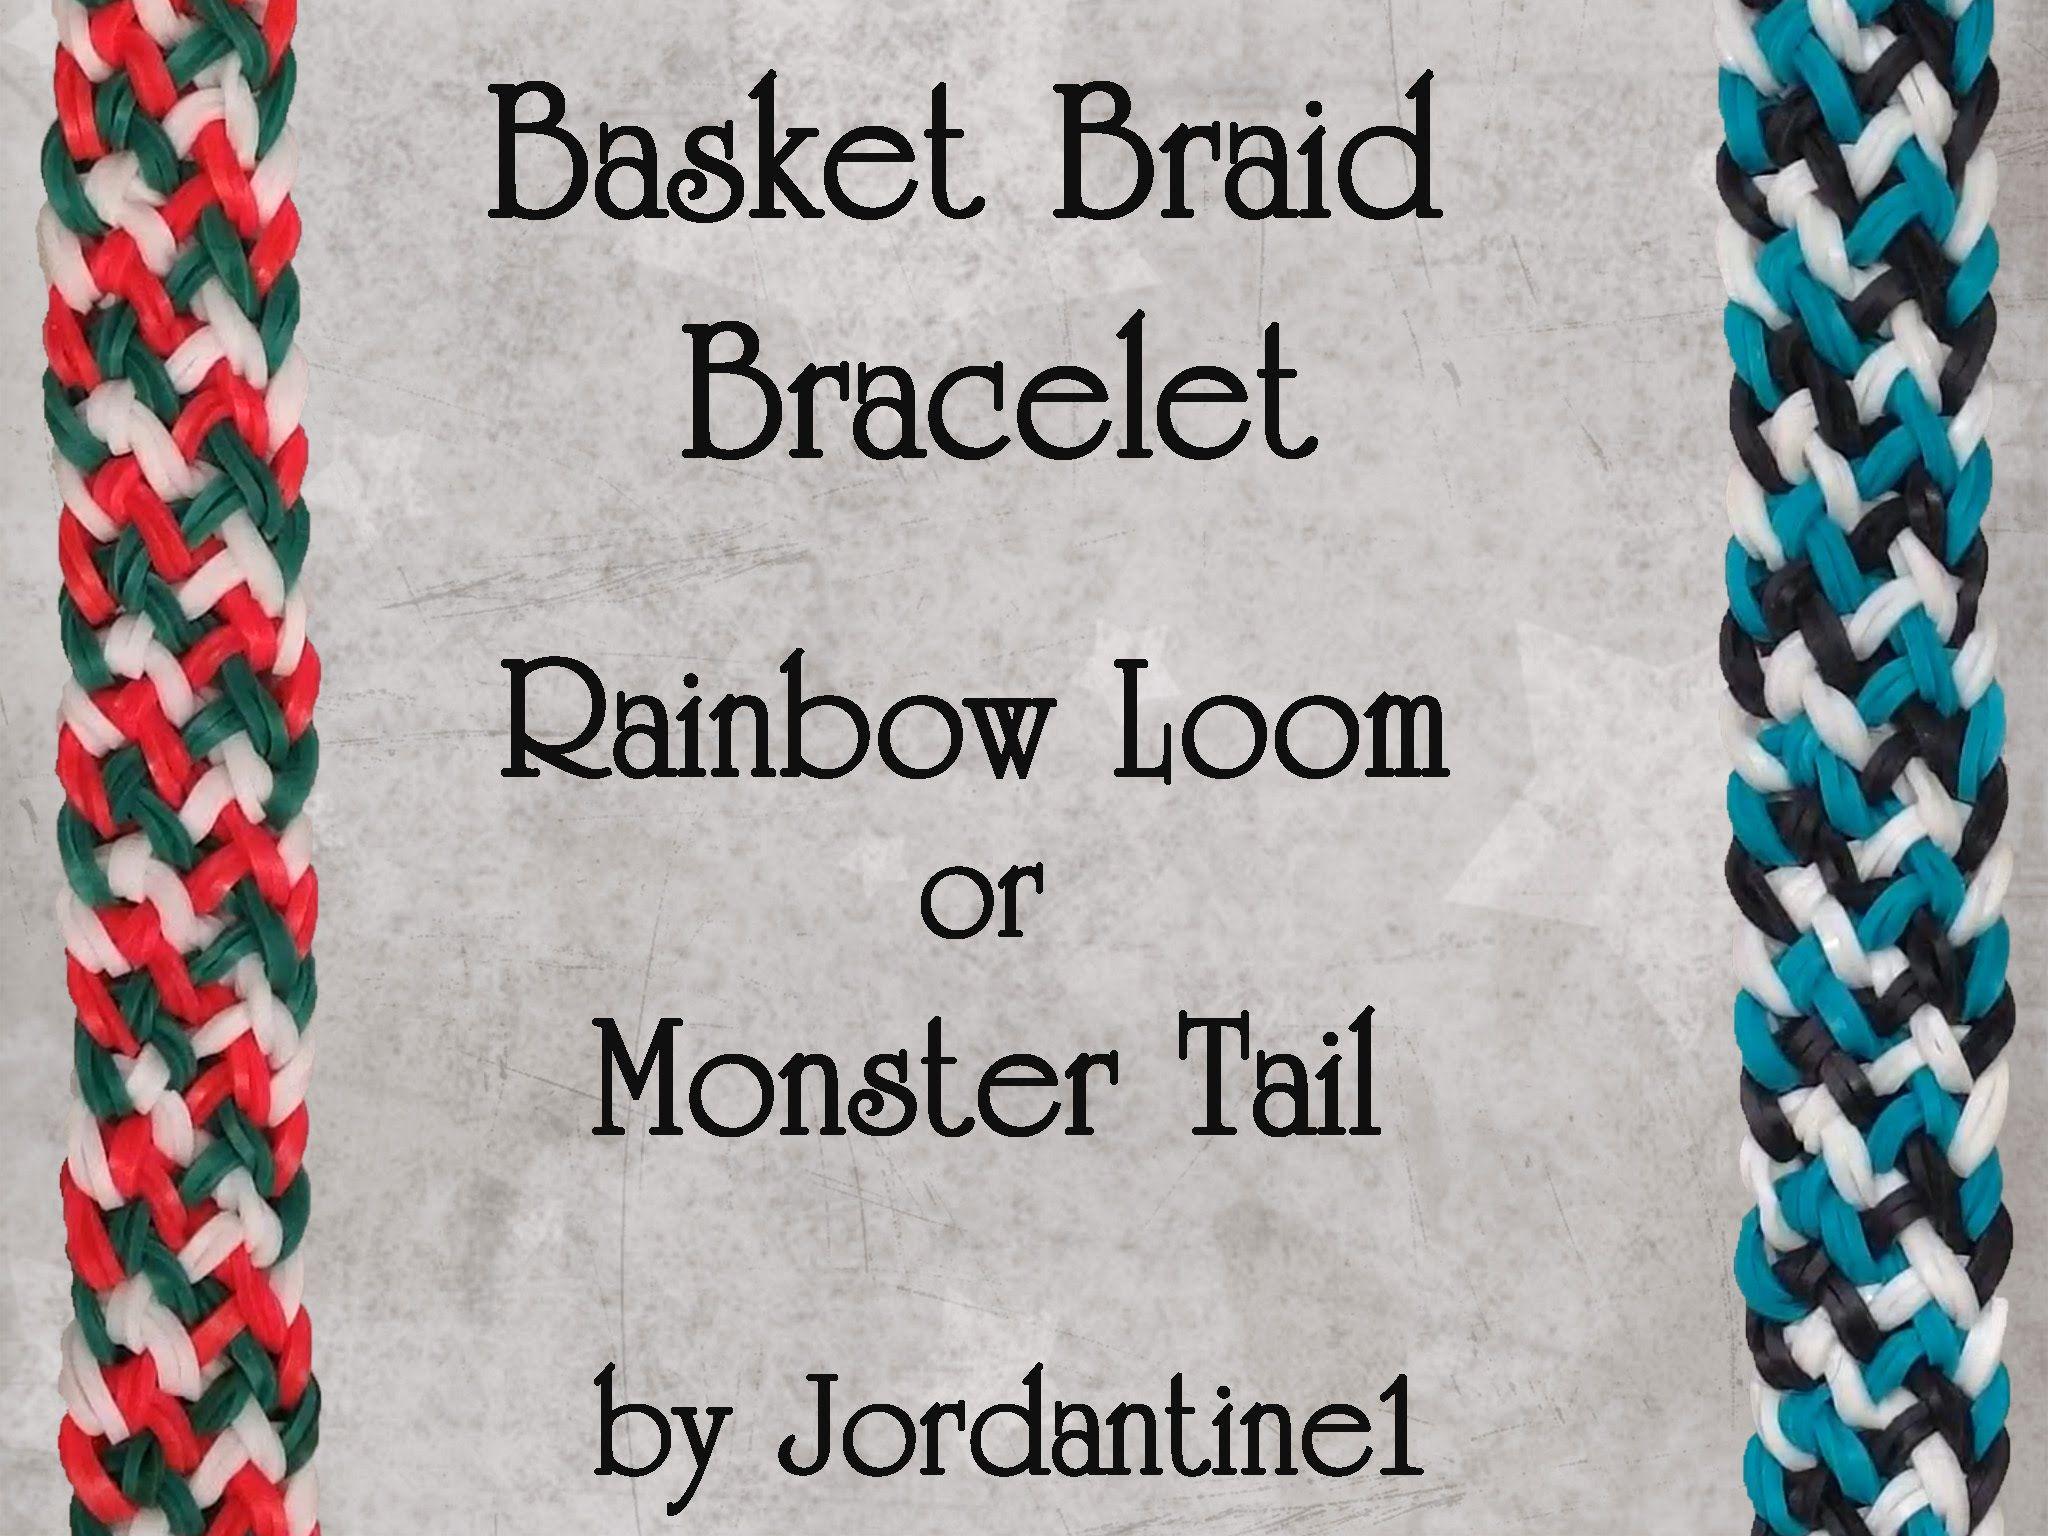 New Basket Braid Bracelet Rainbow Loom or Monster Tail